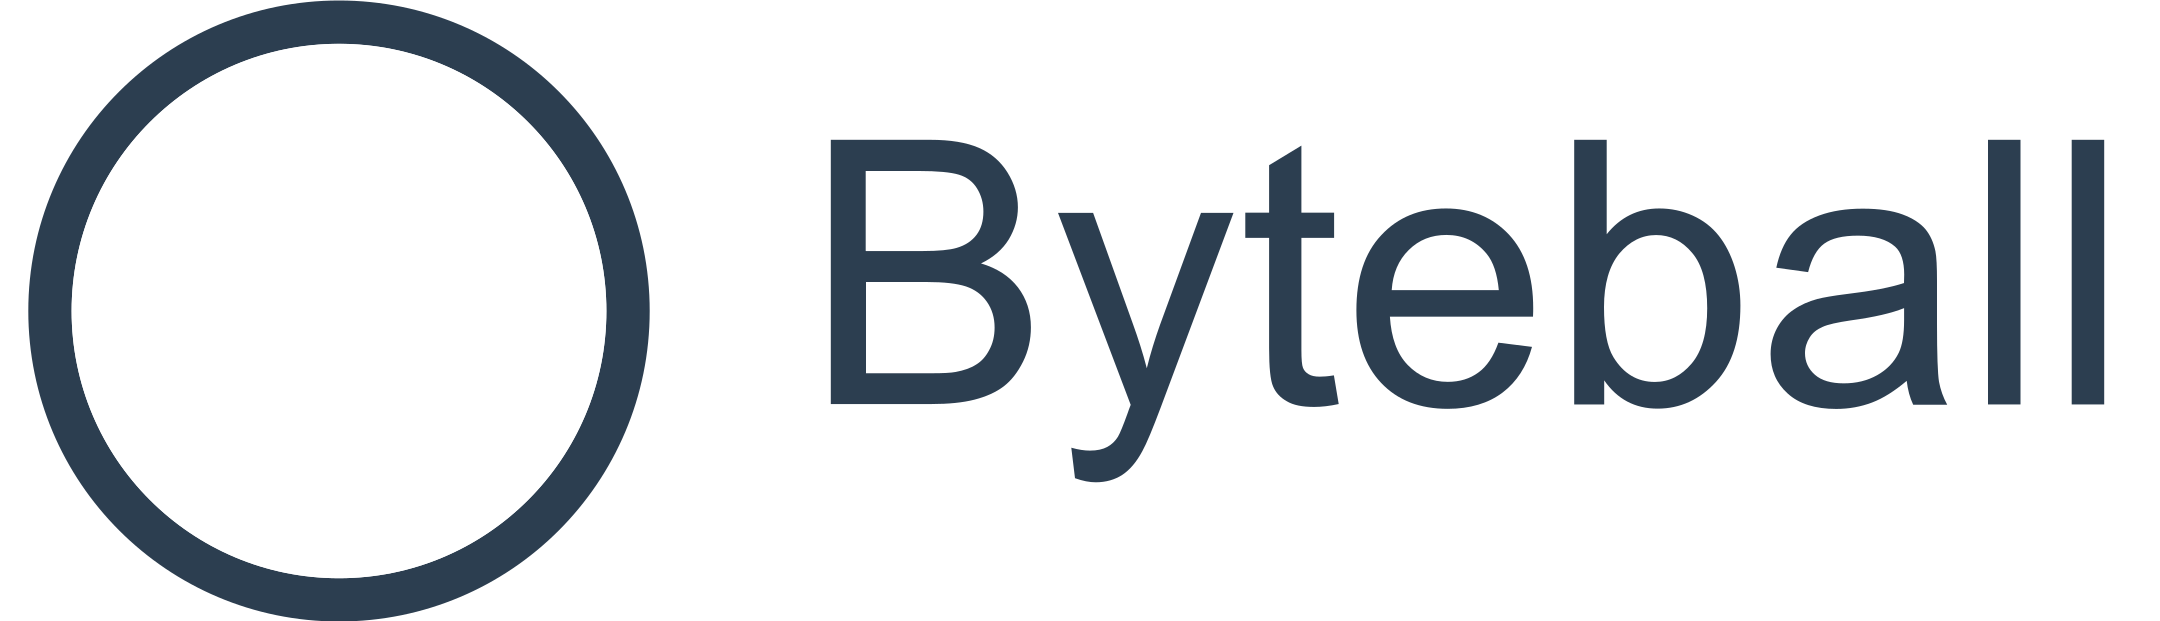 Byteball.org